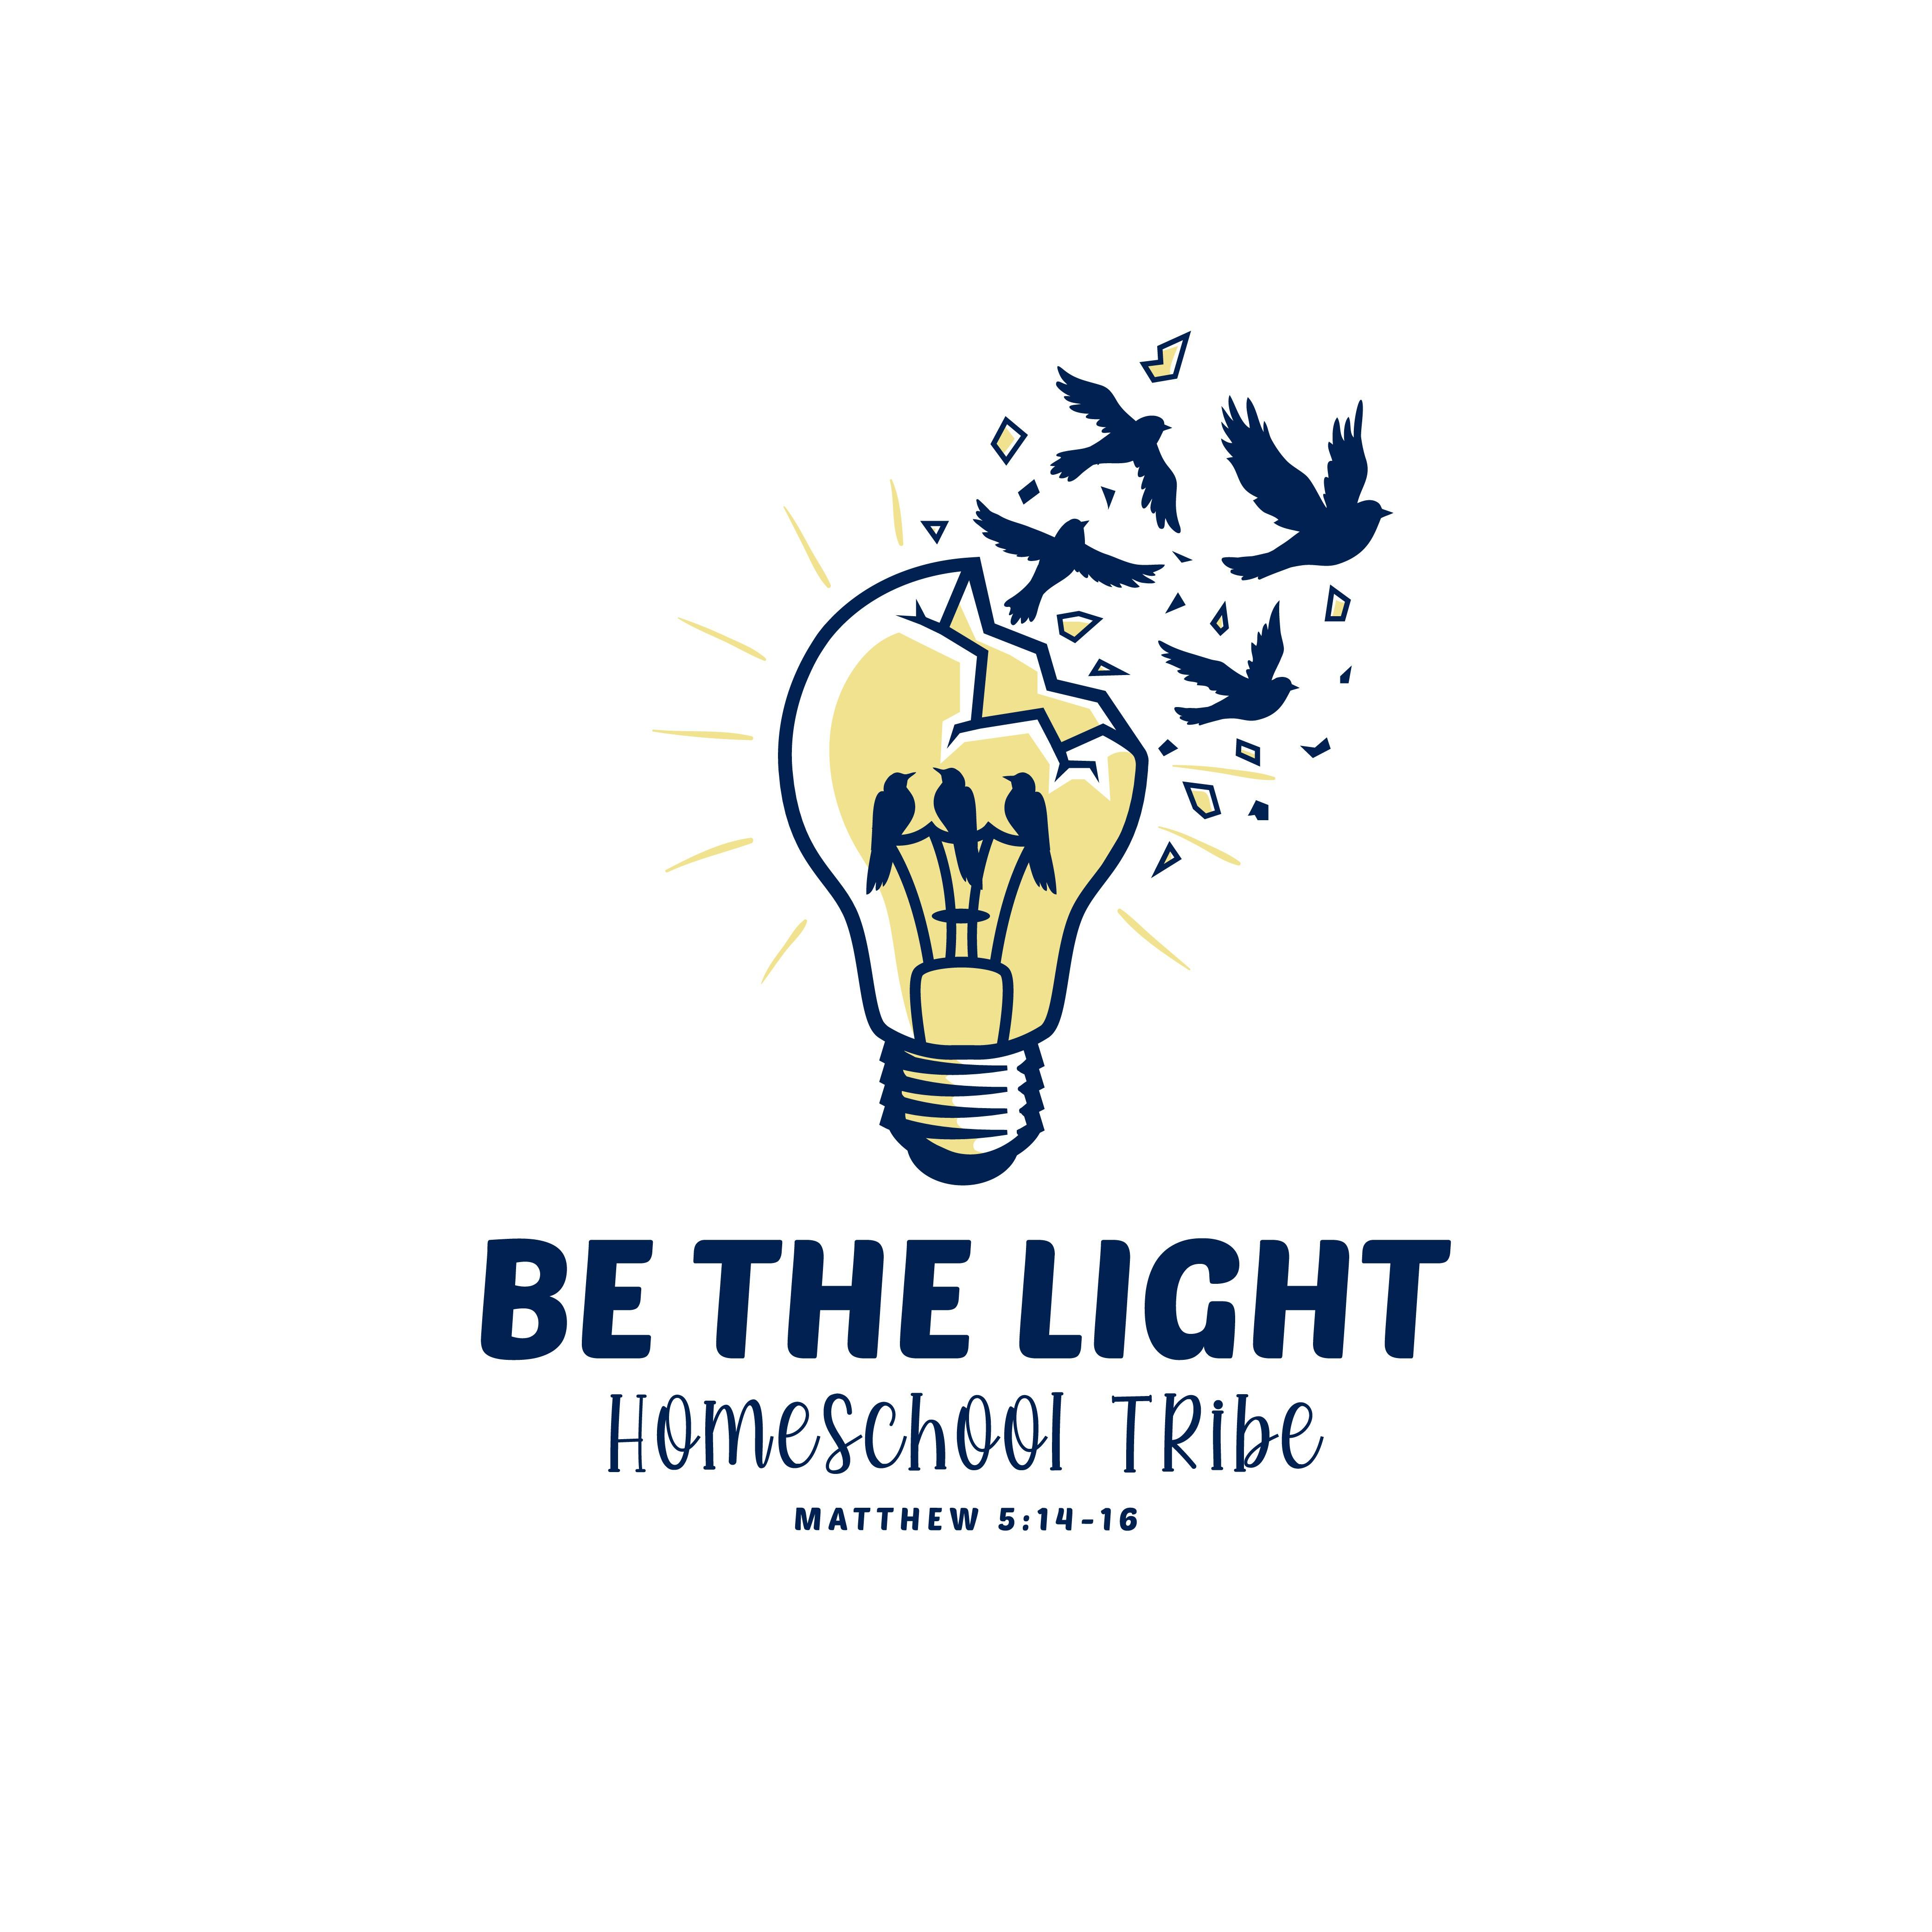 Be the Light- Homeschool Tribe